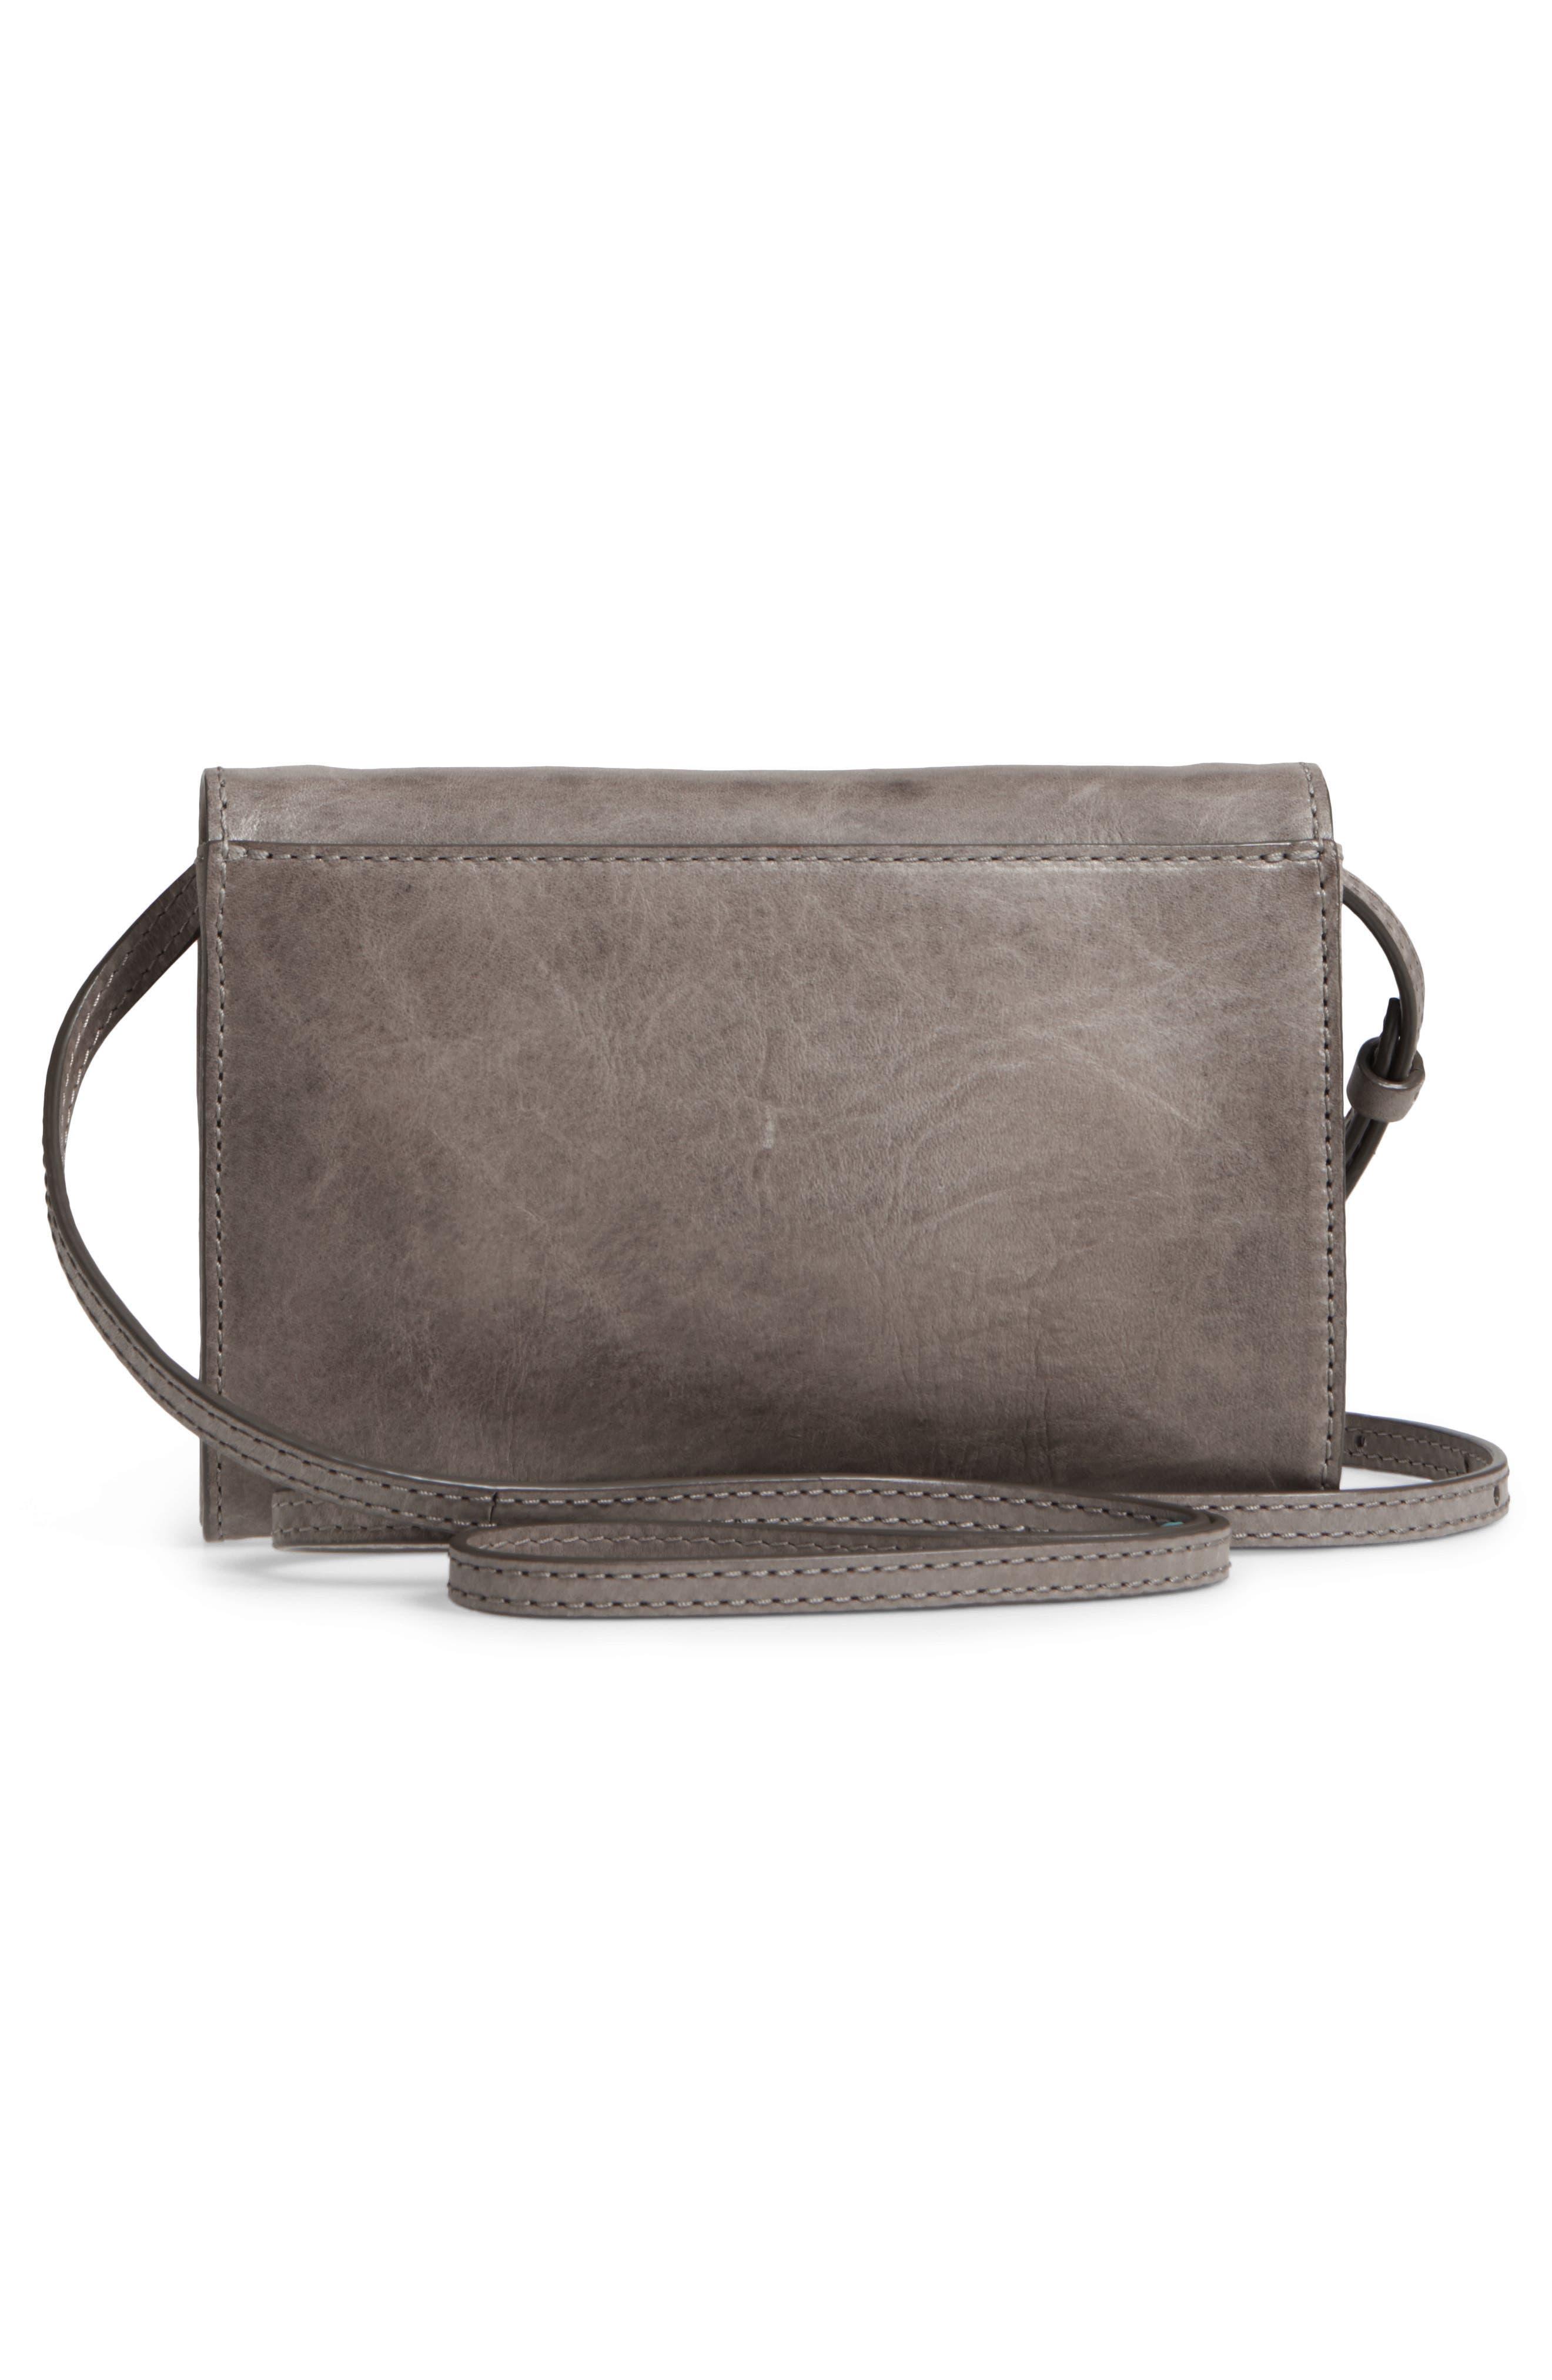 Melissa Leather Crossbody Bag,                             Alternate thumbnail 3, color,                             ICE